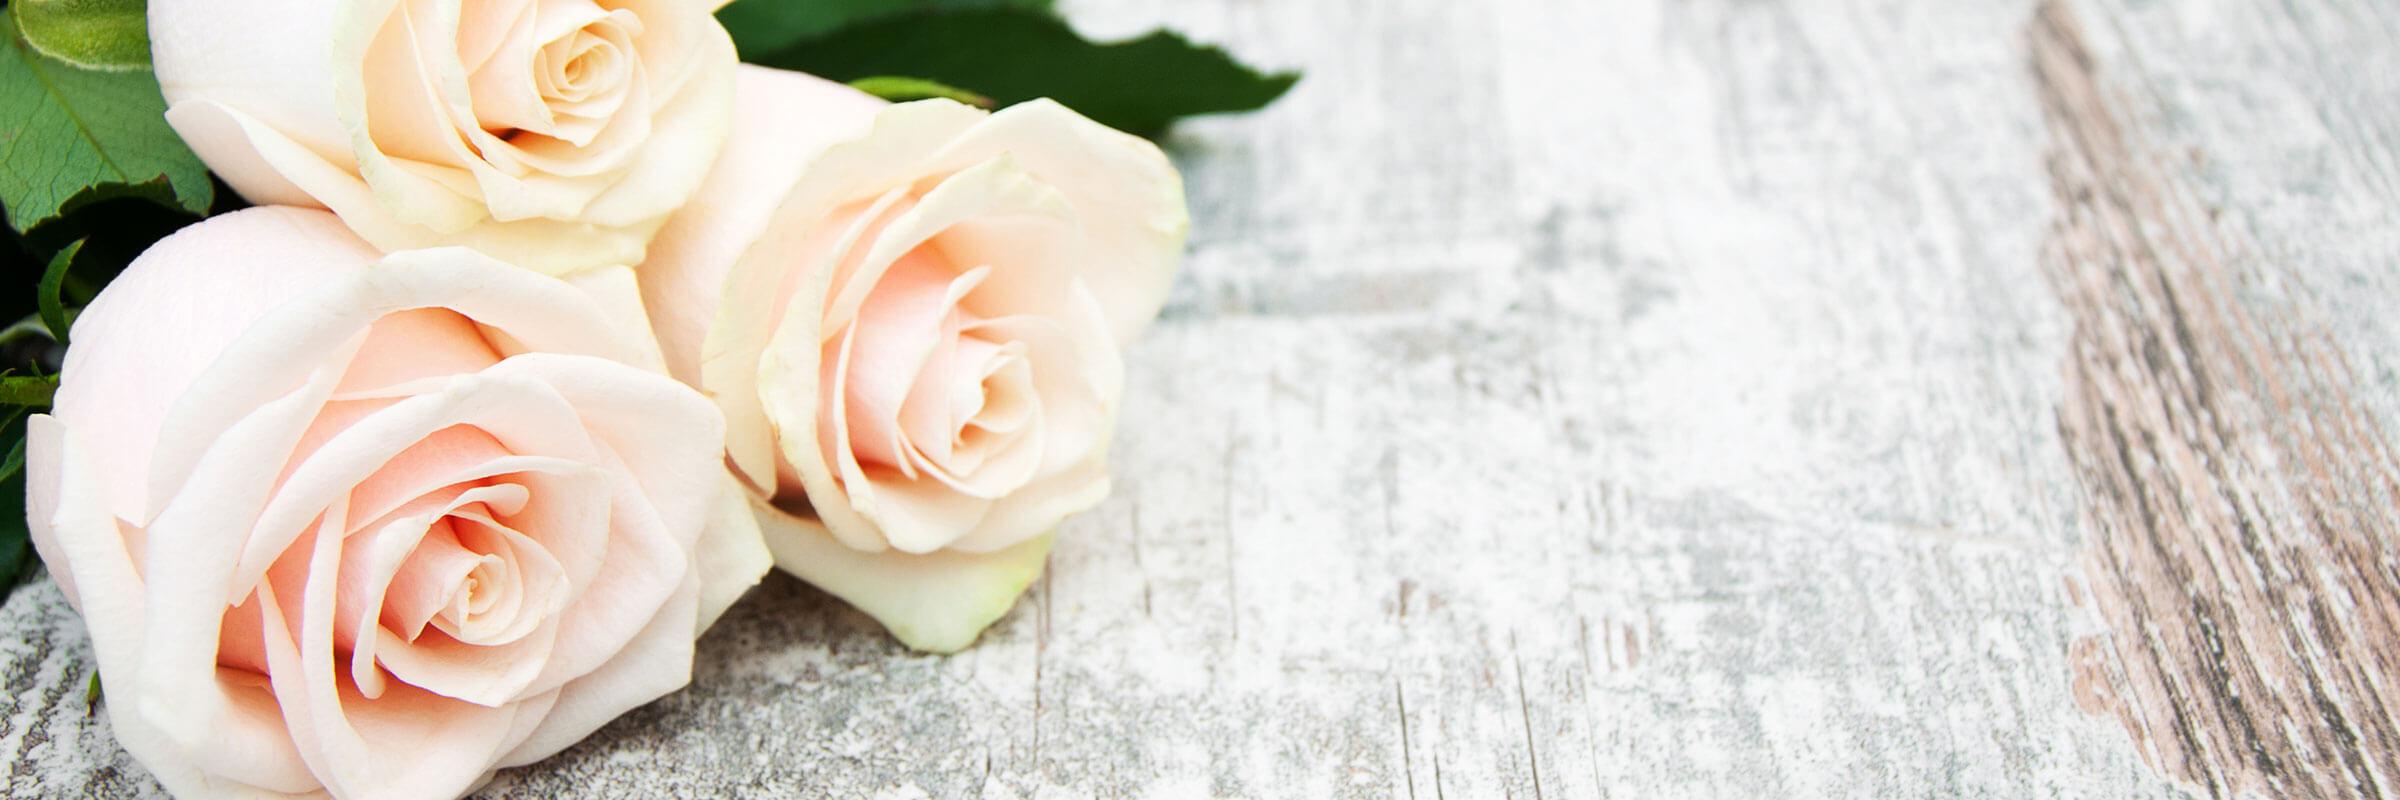 roses-on-wood